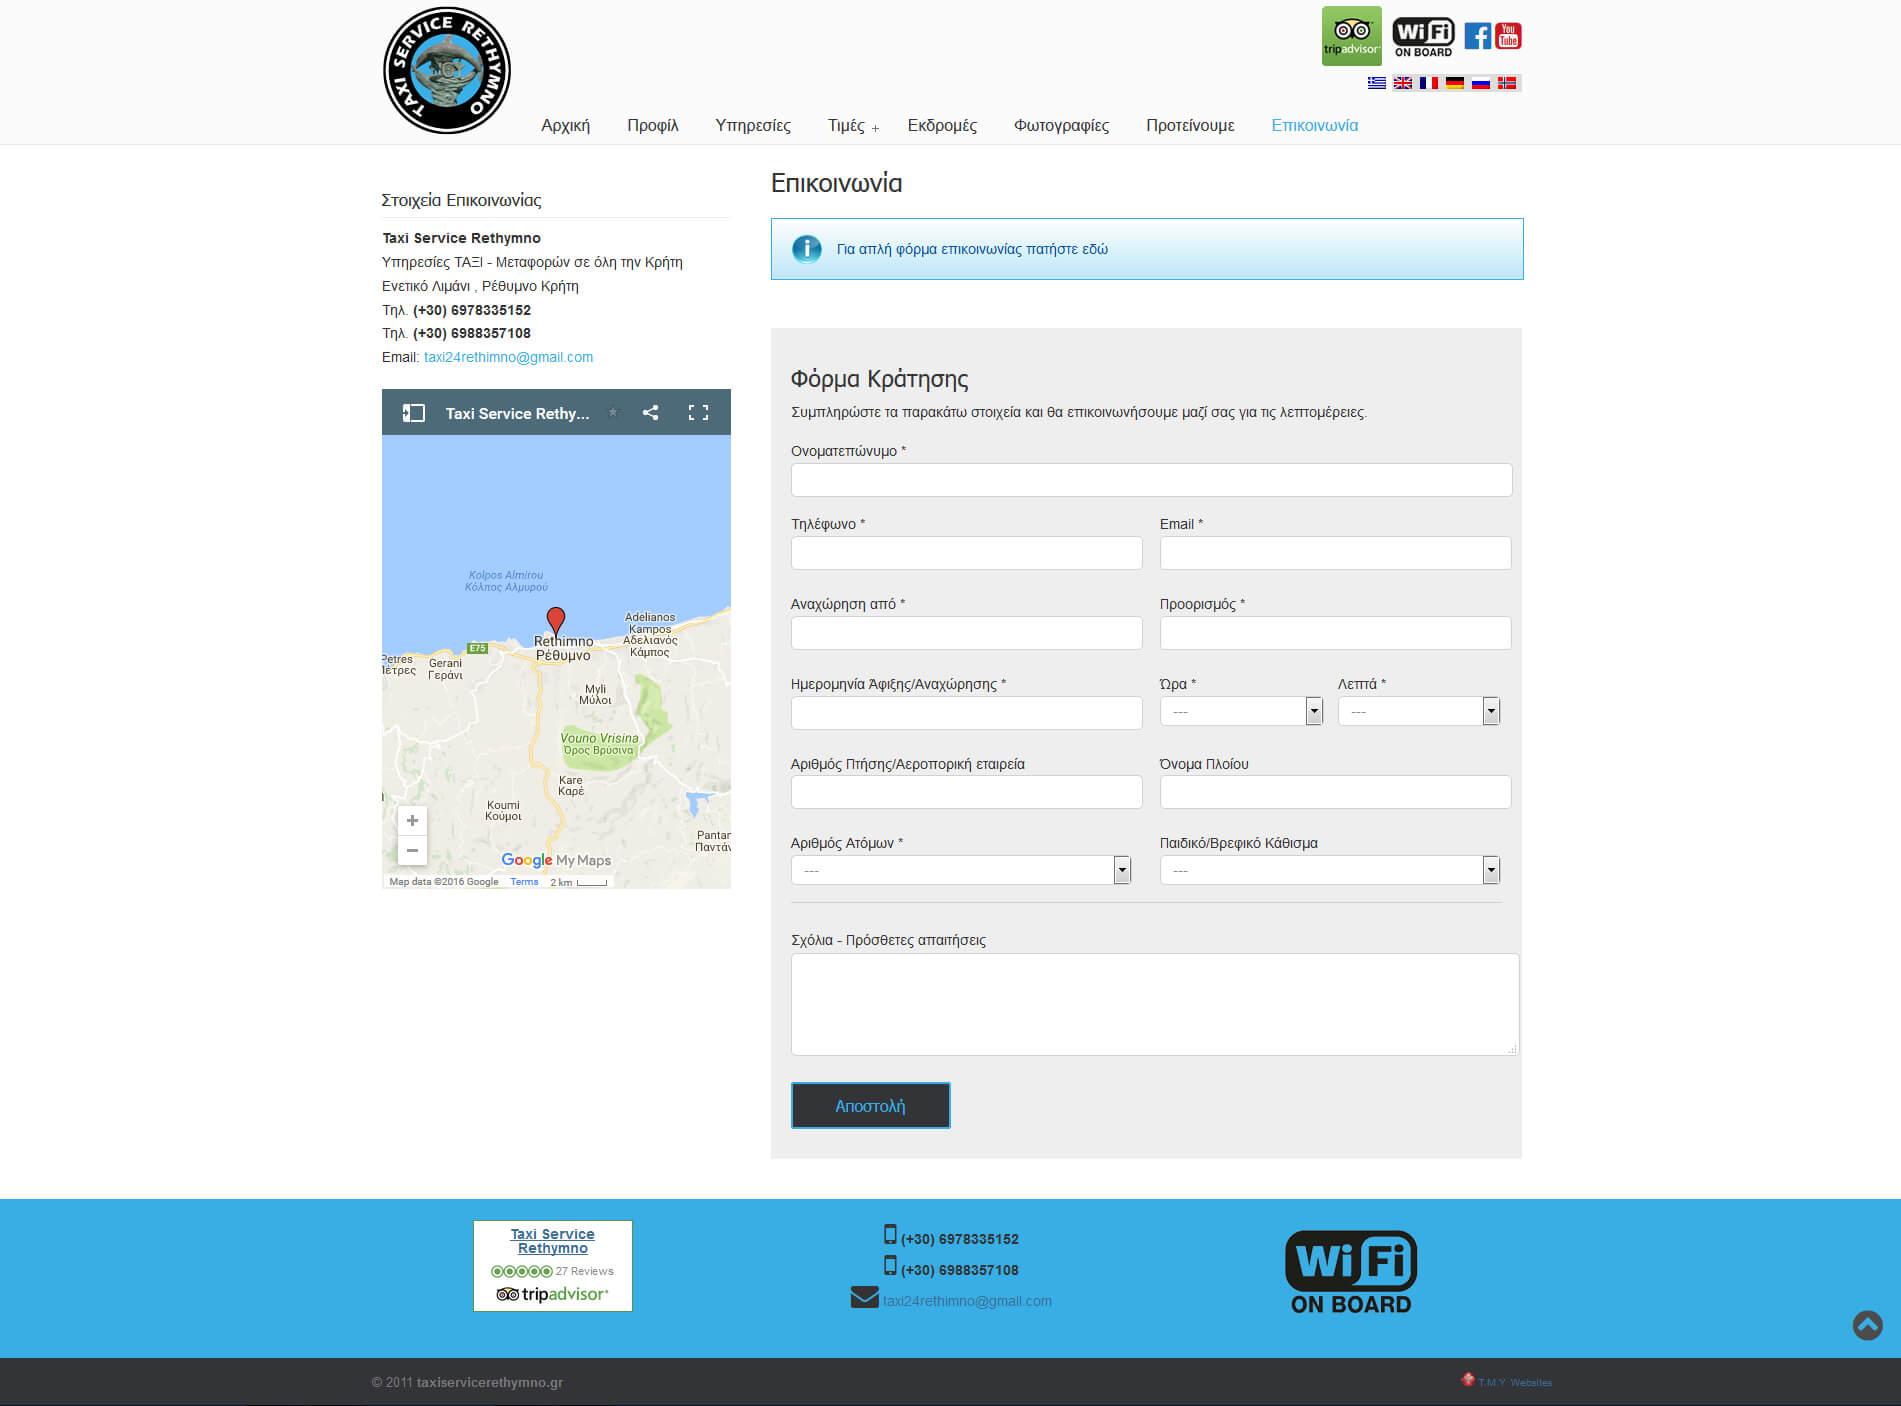 Taxi Service Rethymno - Contact Form